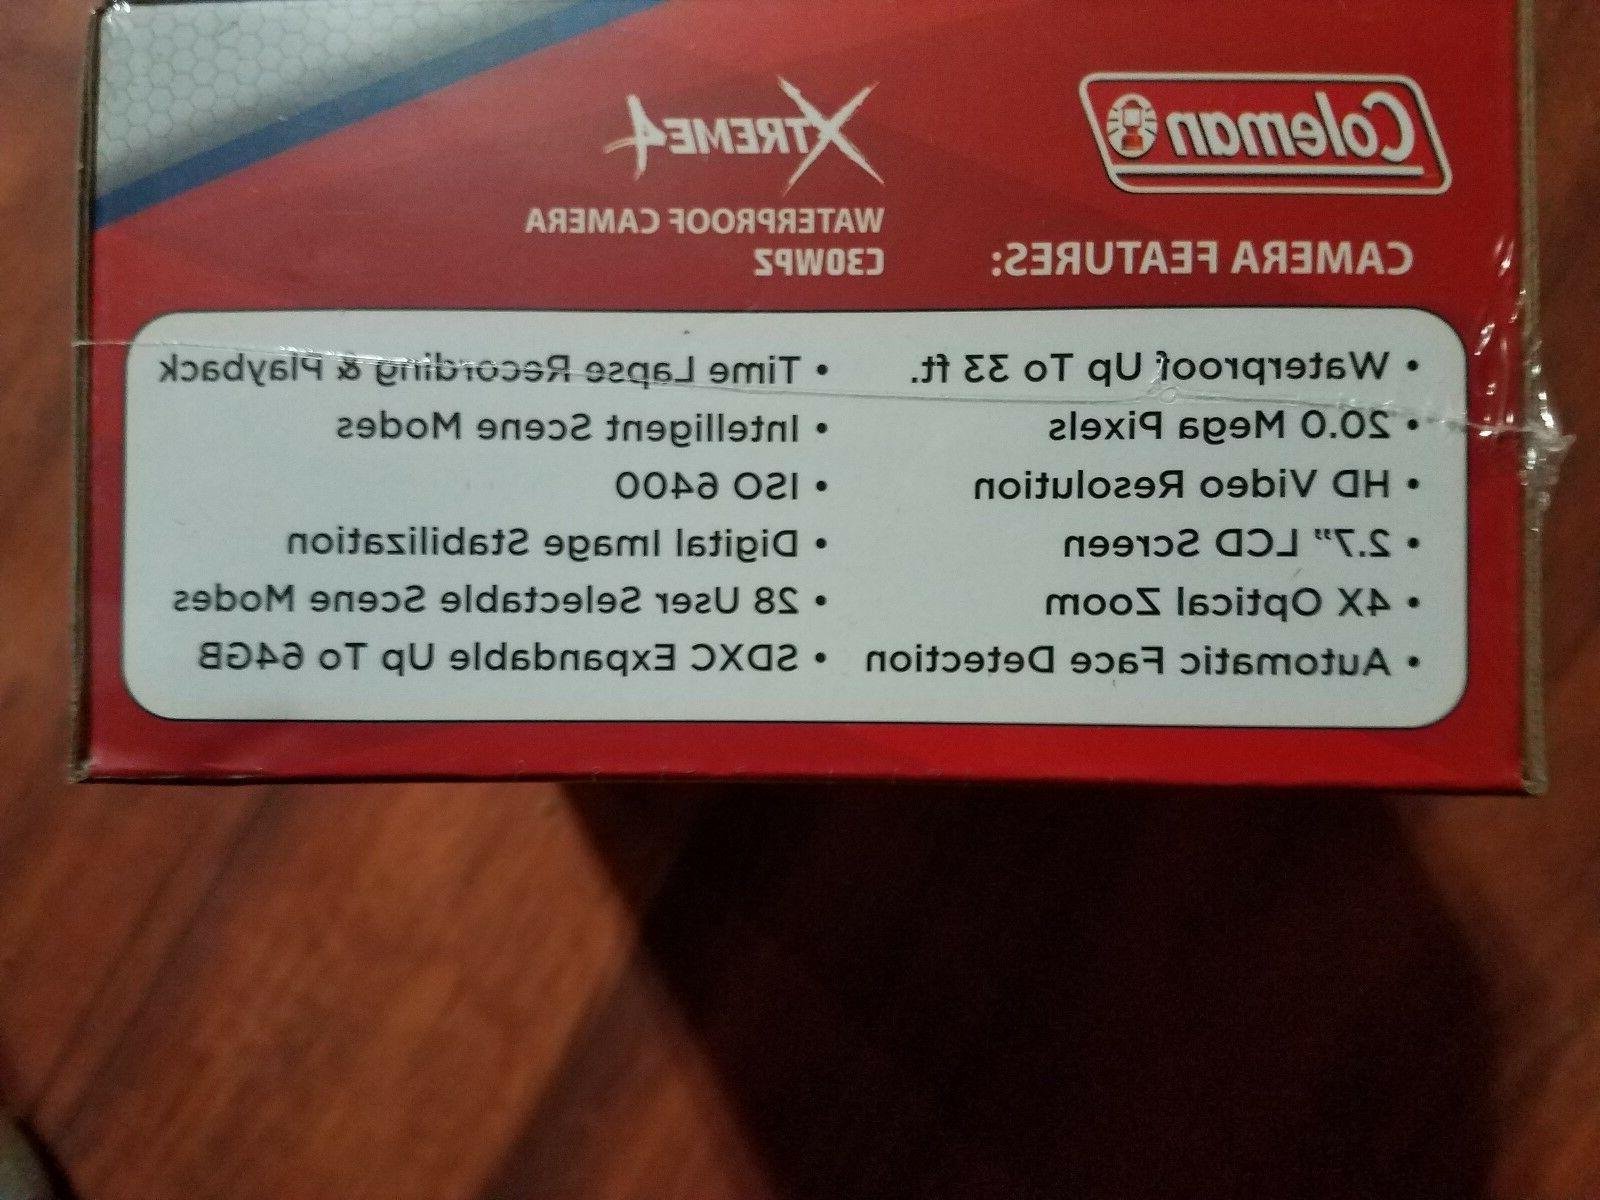 Coleman 20.0-Megapixel Xtreme4 HD Waterproof Camera